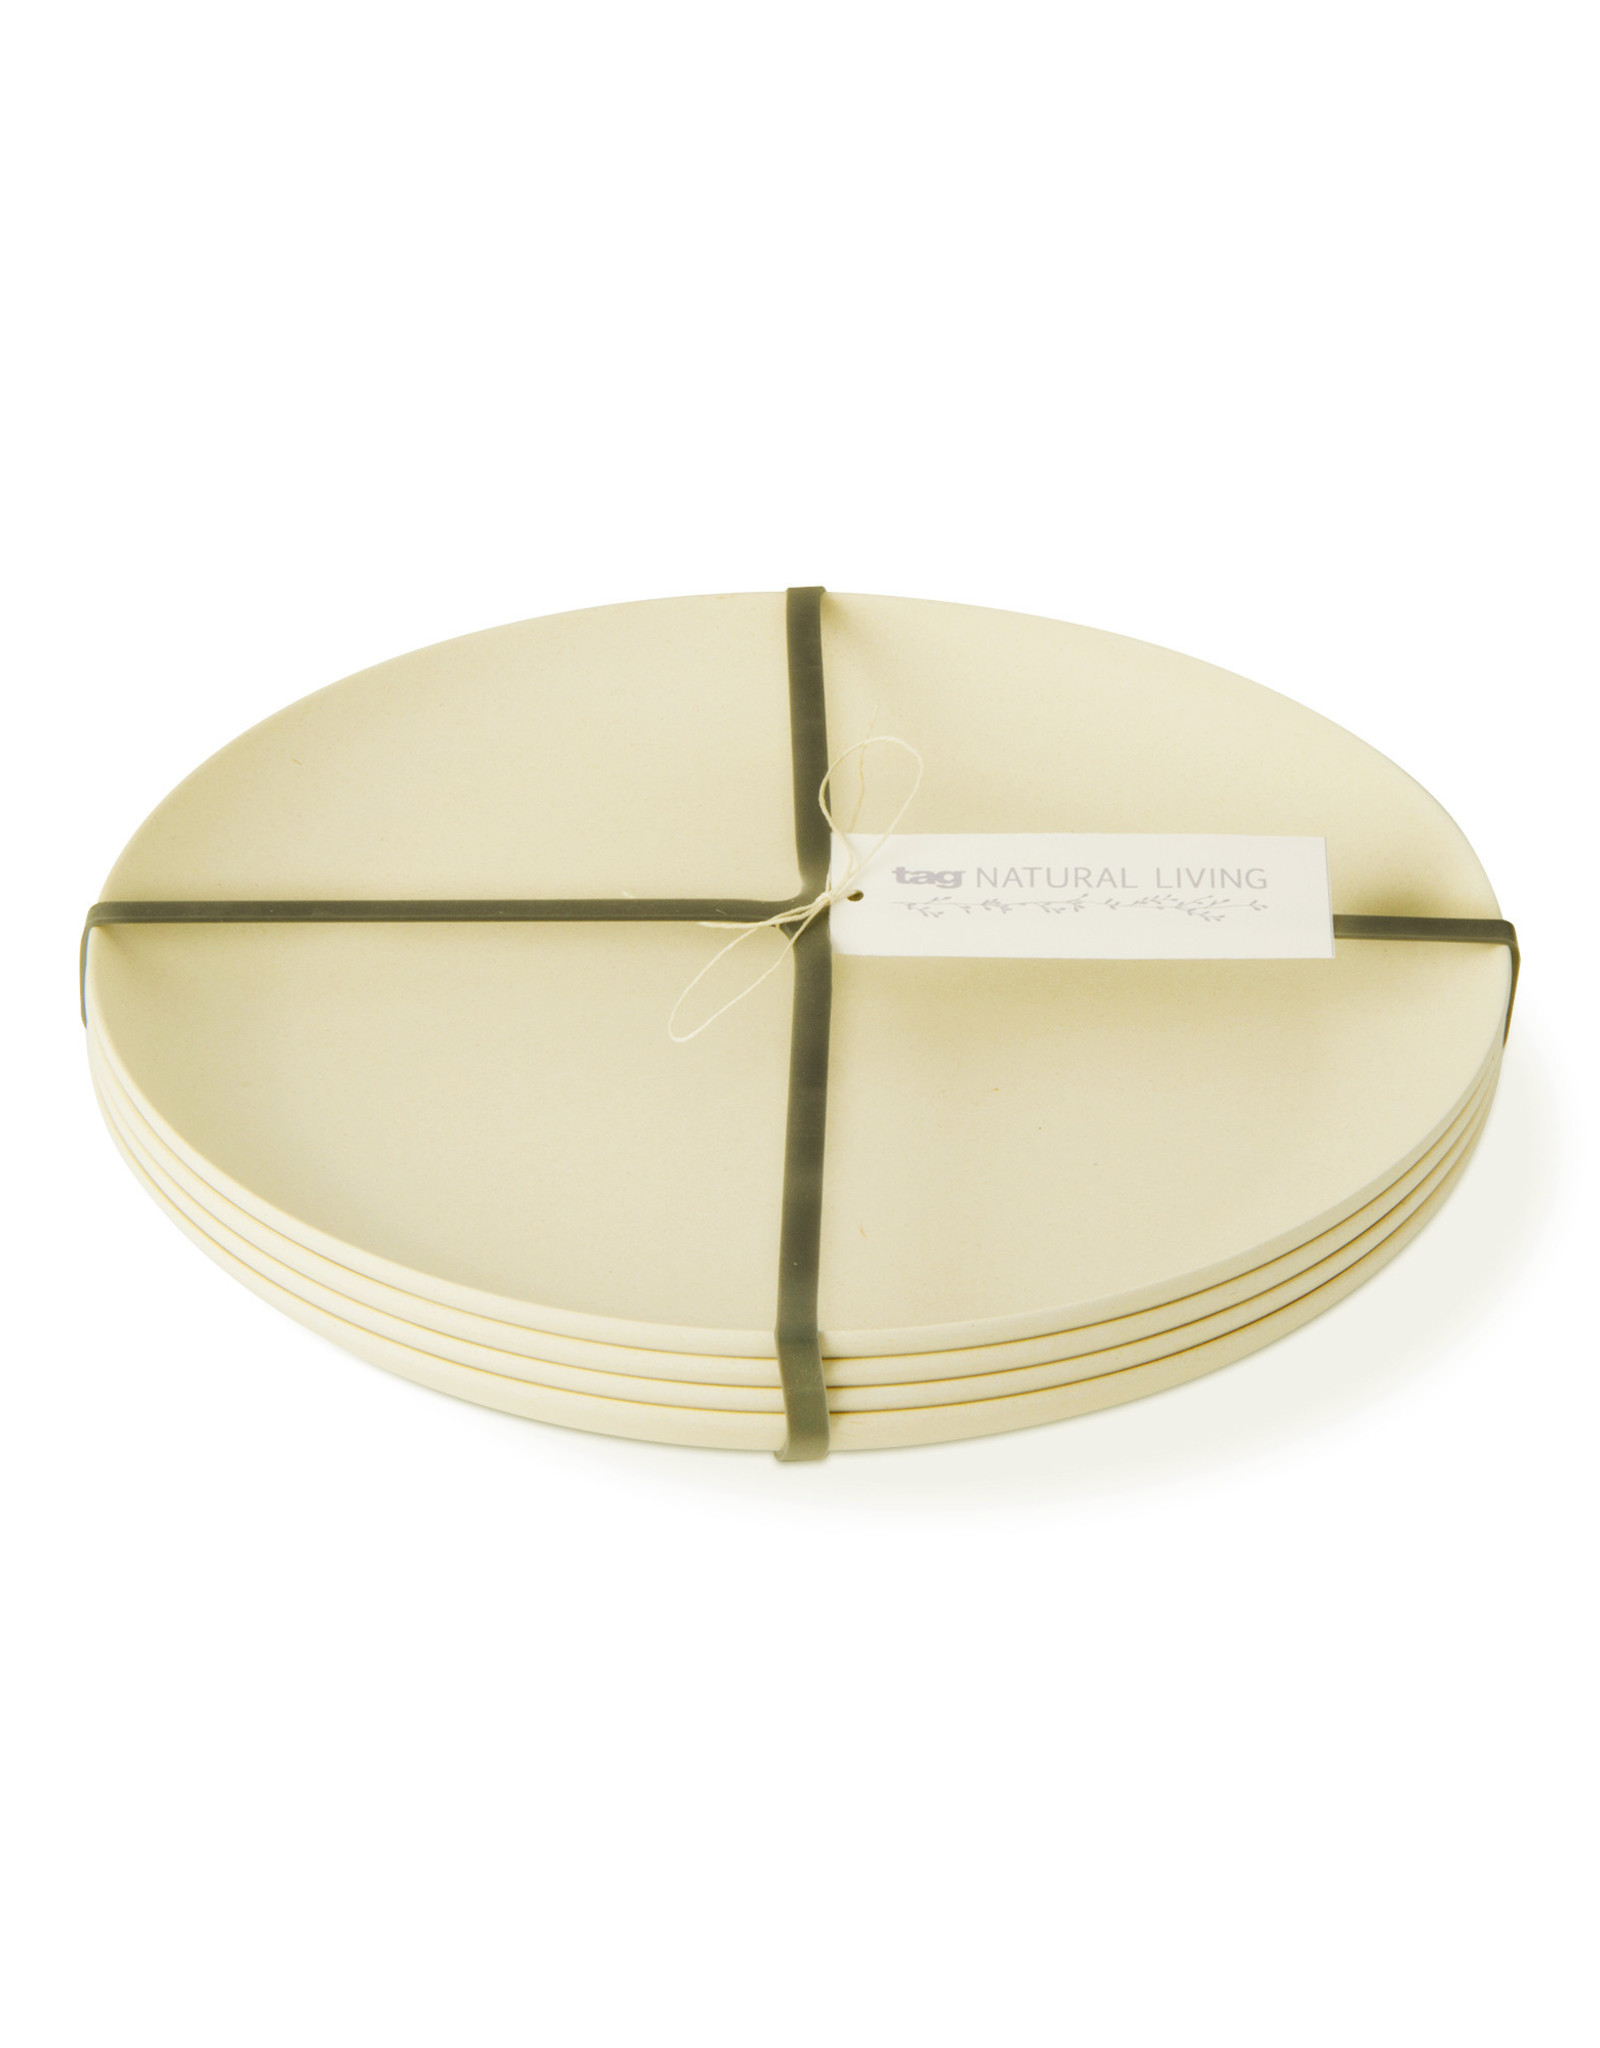 Bamboo Fiber Dinner Plate - Set of 4 - Natural